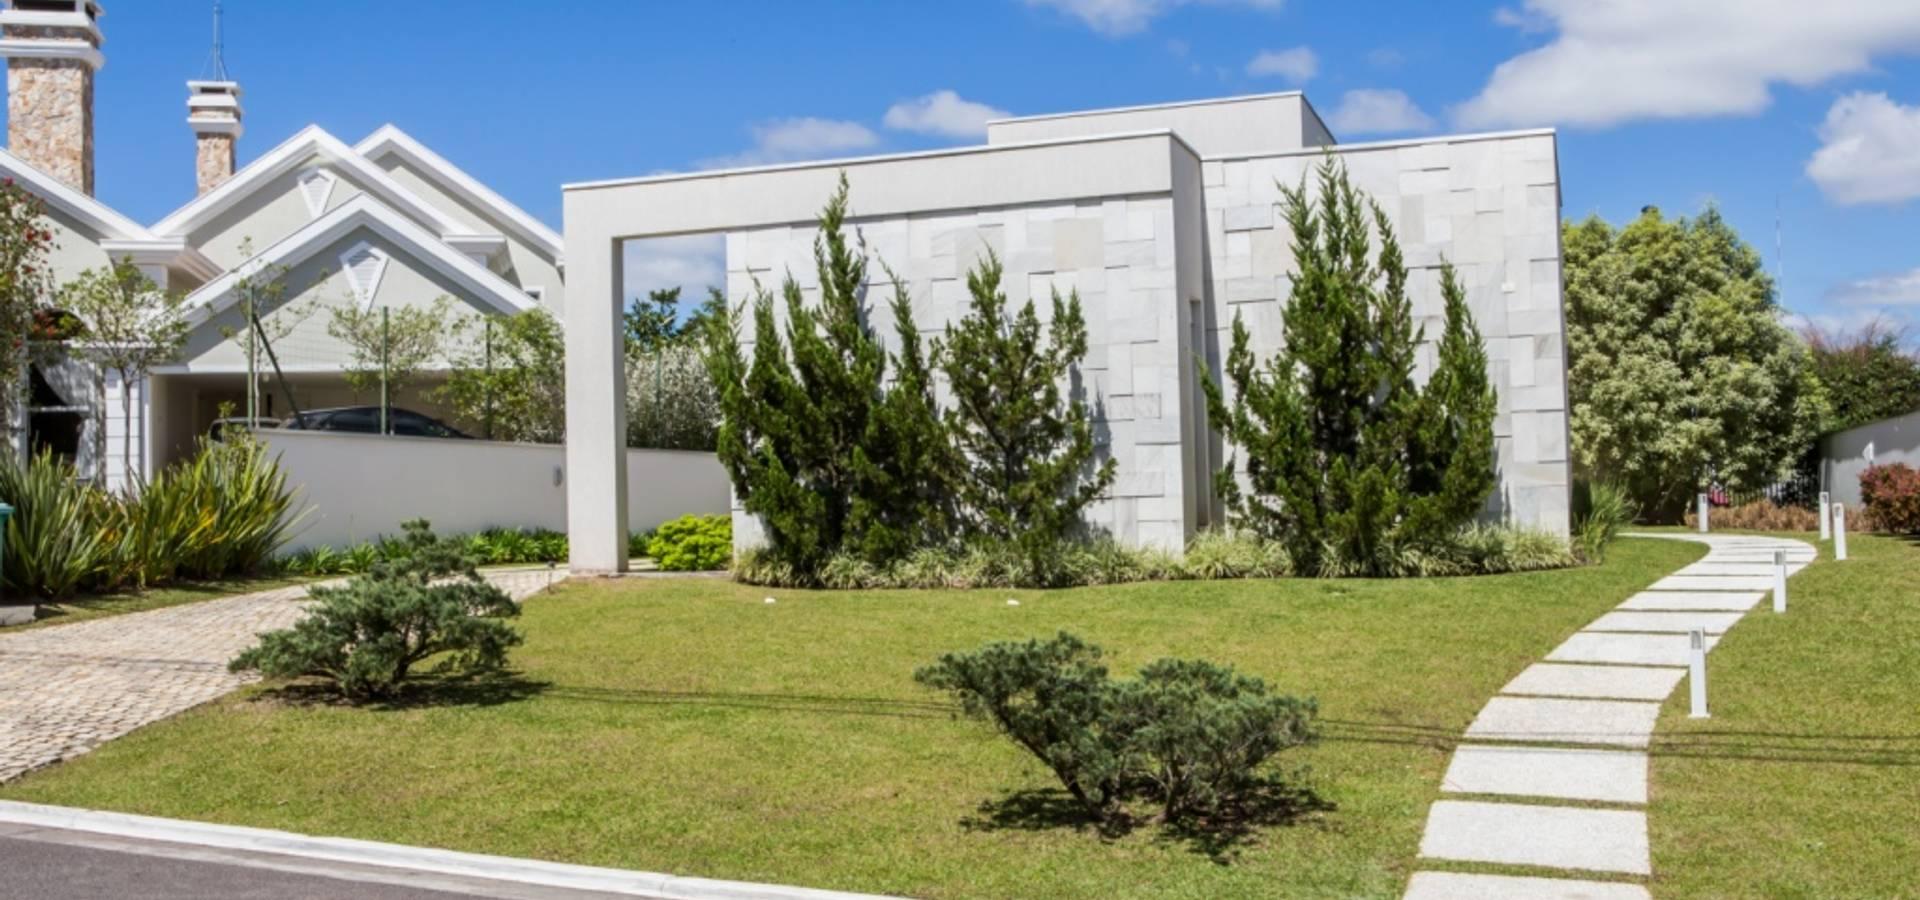 Bernacki Arquitetura